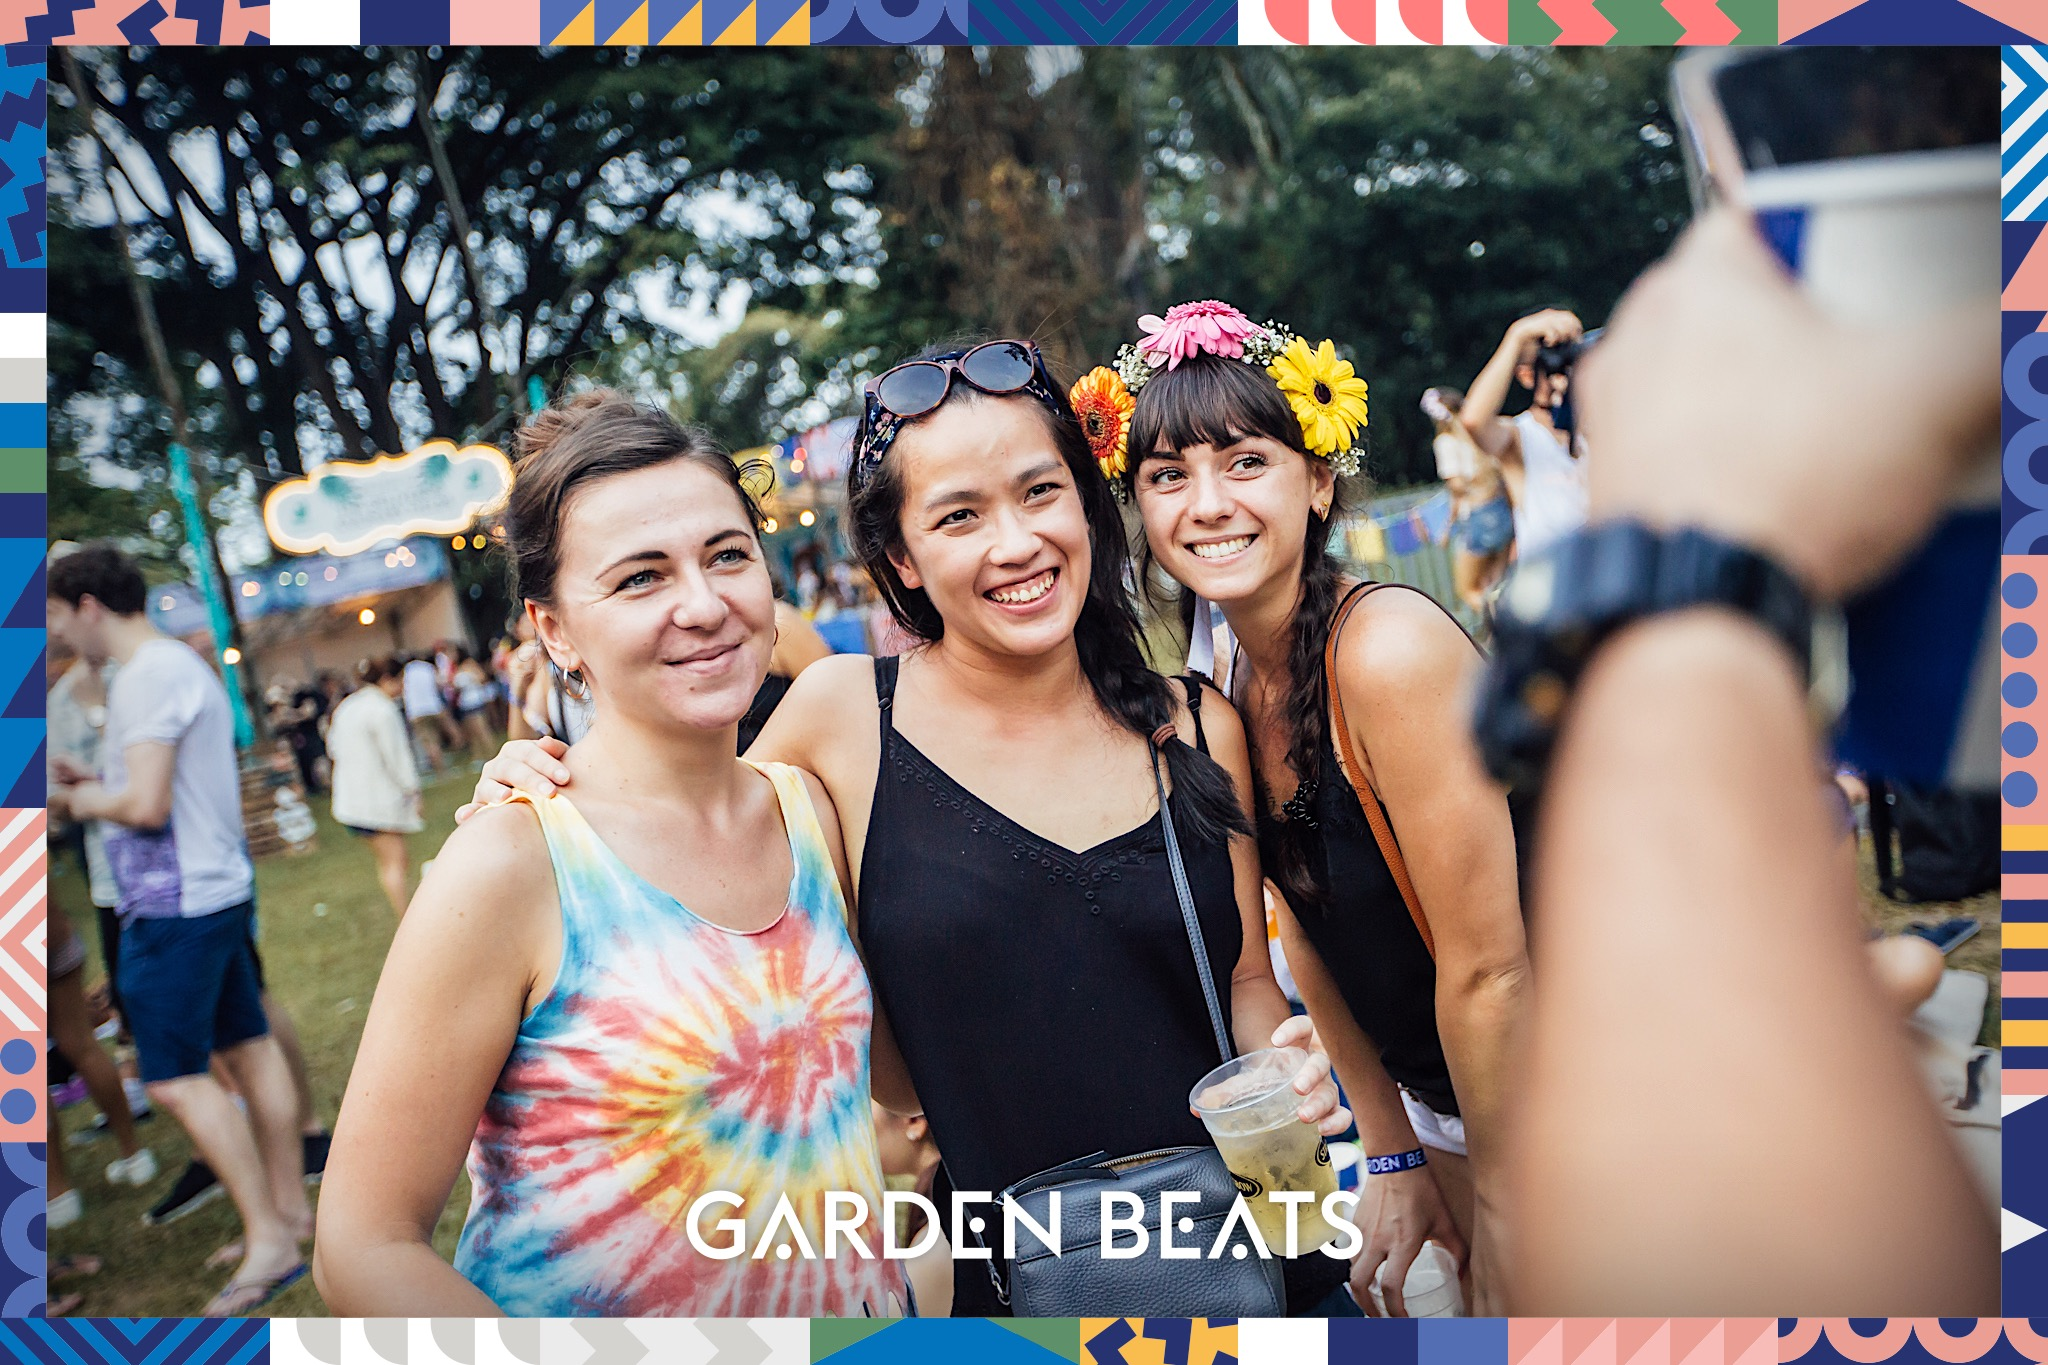 18032017_GardenBeats_Colossal629_WatermarkedGB.jpg